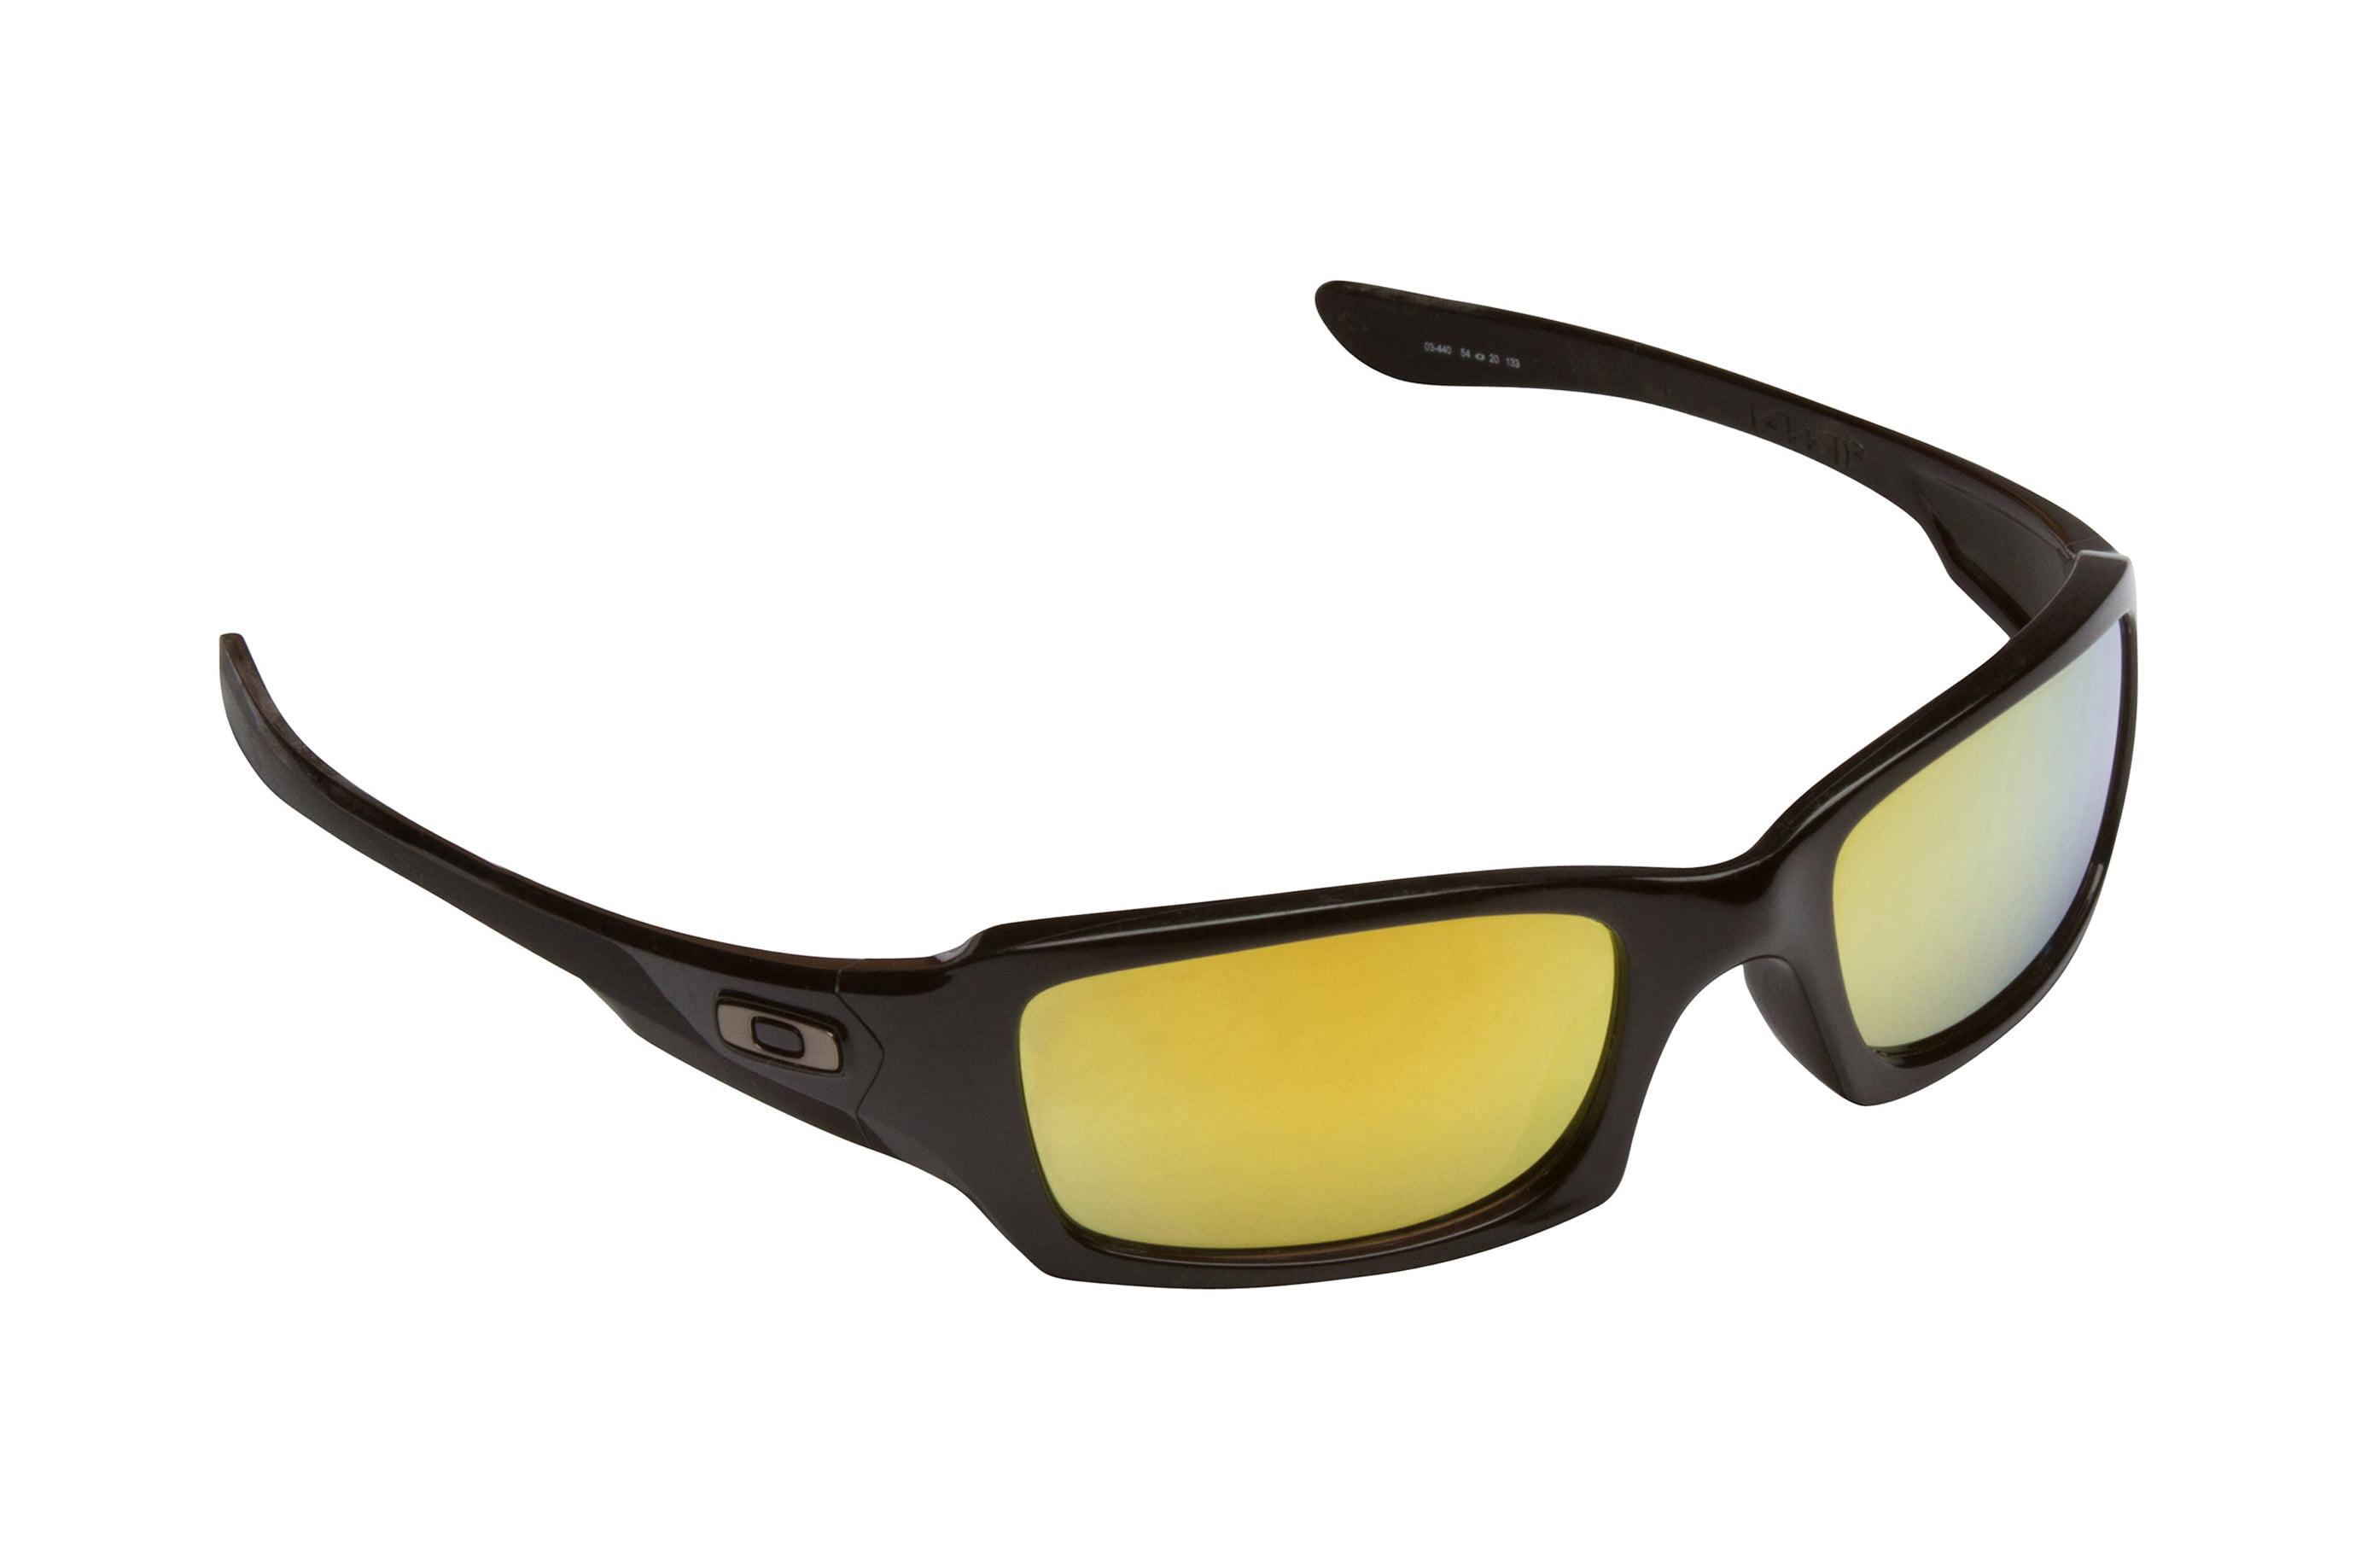 b970a8e353 Seek Optics - Fives Squared Replacement Lenses by SEEK OPTICS to fit OAKLEY  Sunglasses - Walmart.com